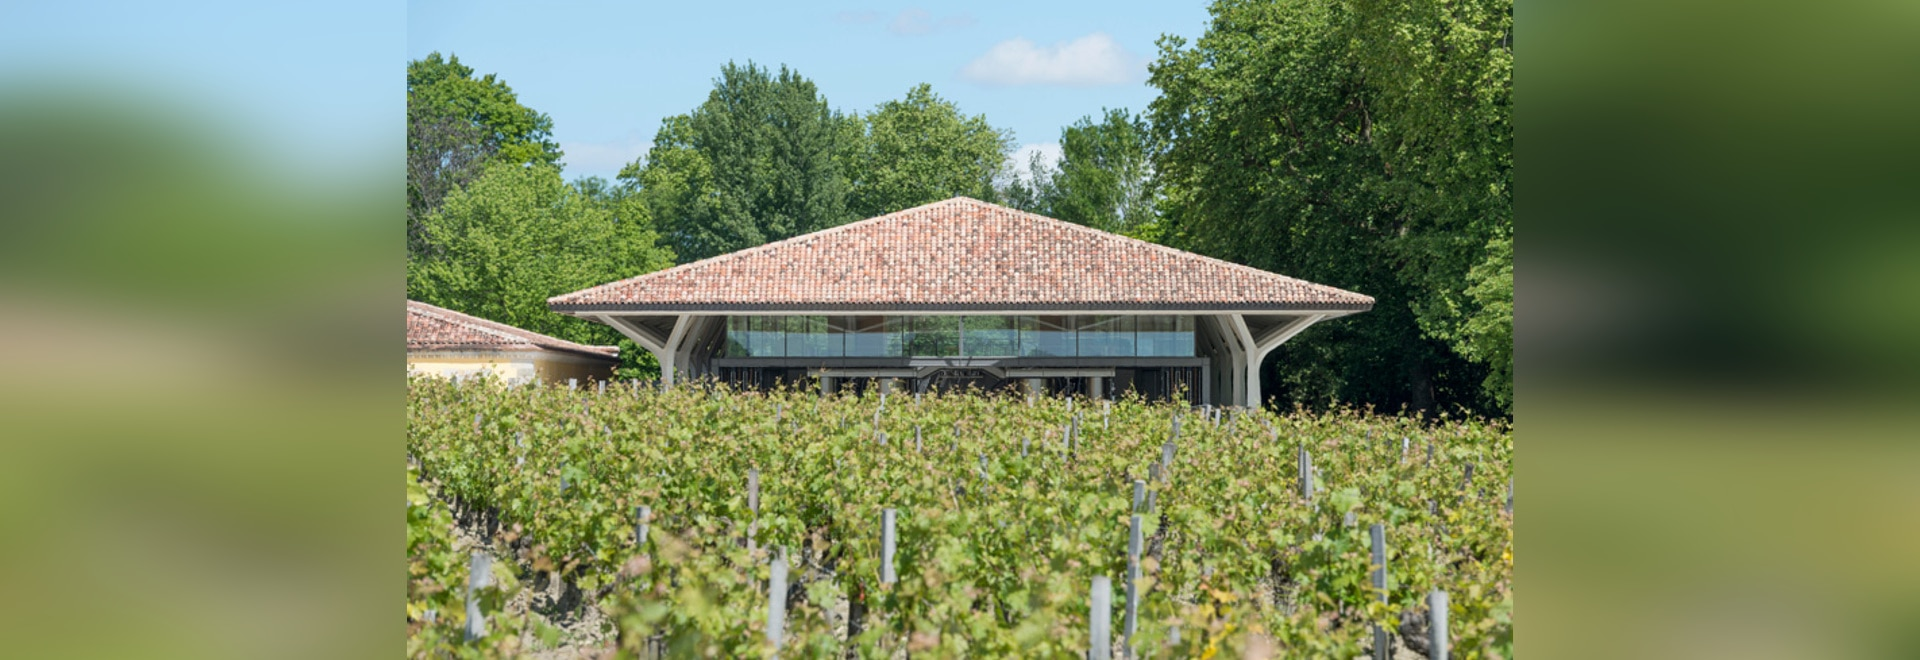 the design reinterprets the region's vernacular style of tiled roofs